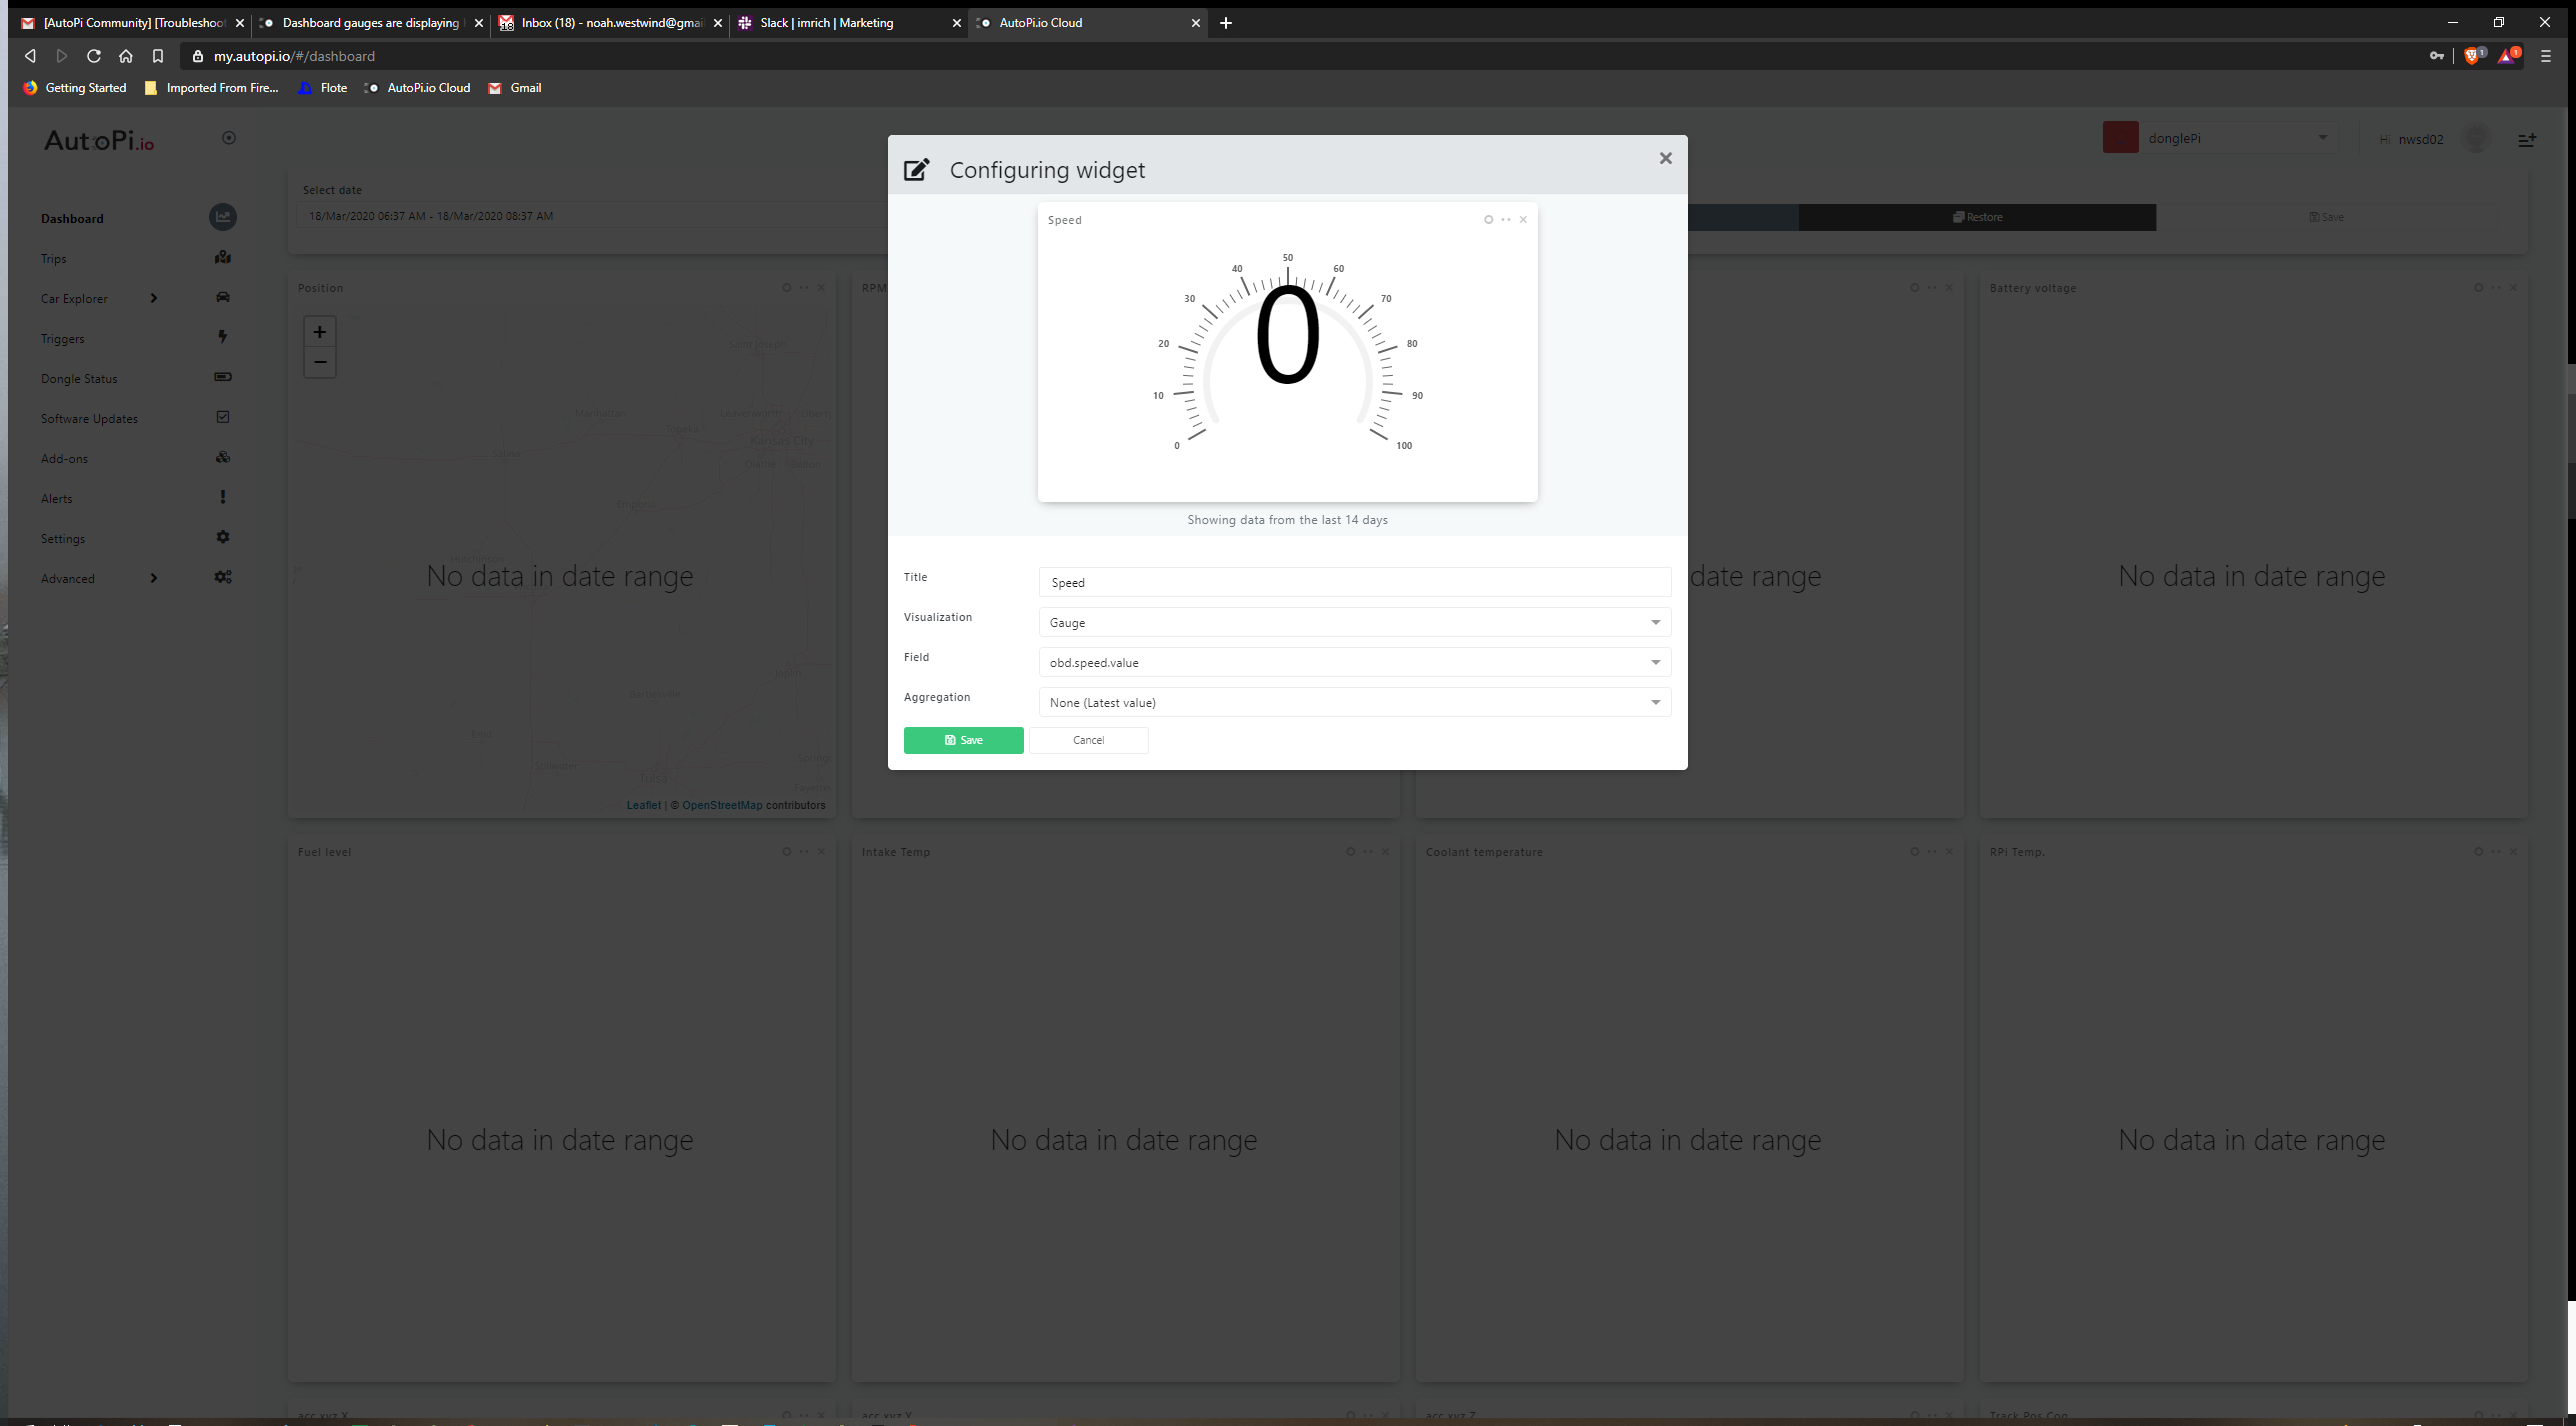 Screenshot 2020-03-18 08.37.19